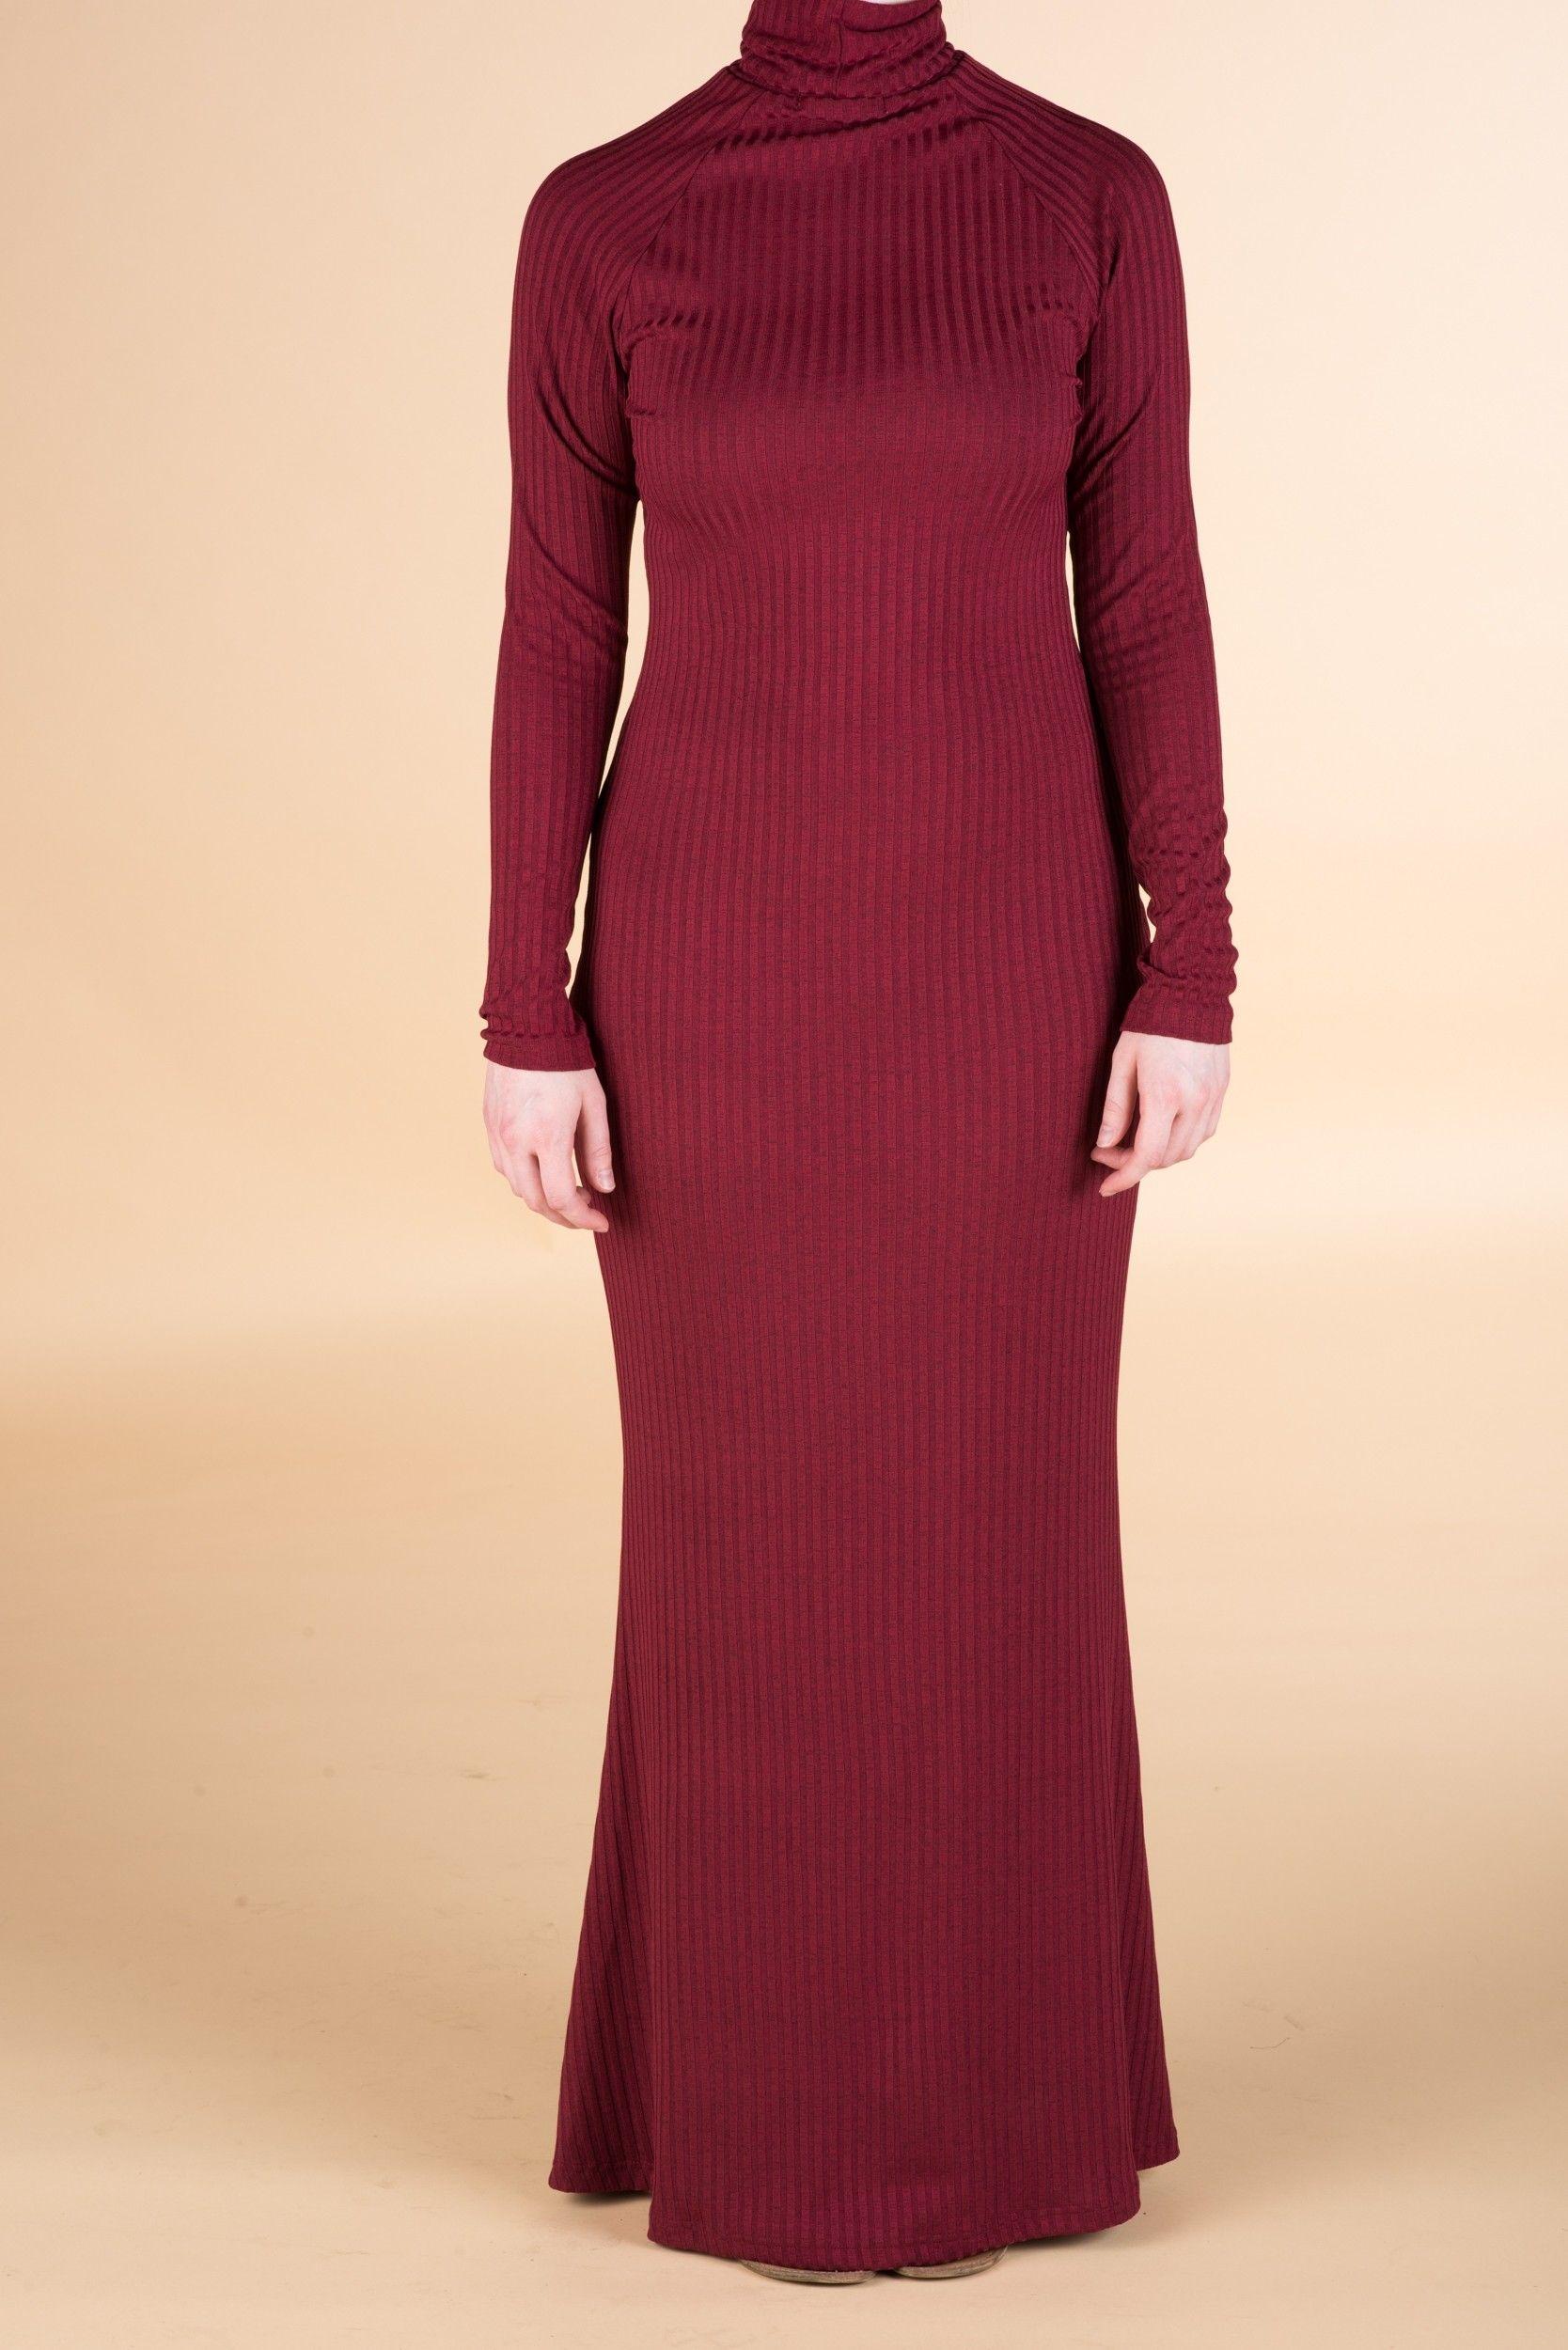 Maroon Turtle Neck Long Sleeve Maxi Dress Modest Maxi Dress Long Sleeve Maxi Dress Dresses [ 2500 x 1668 Pixel ]